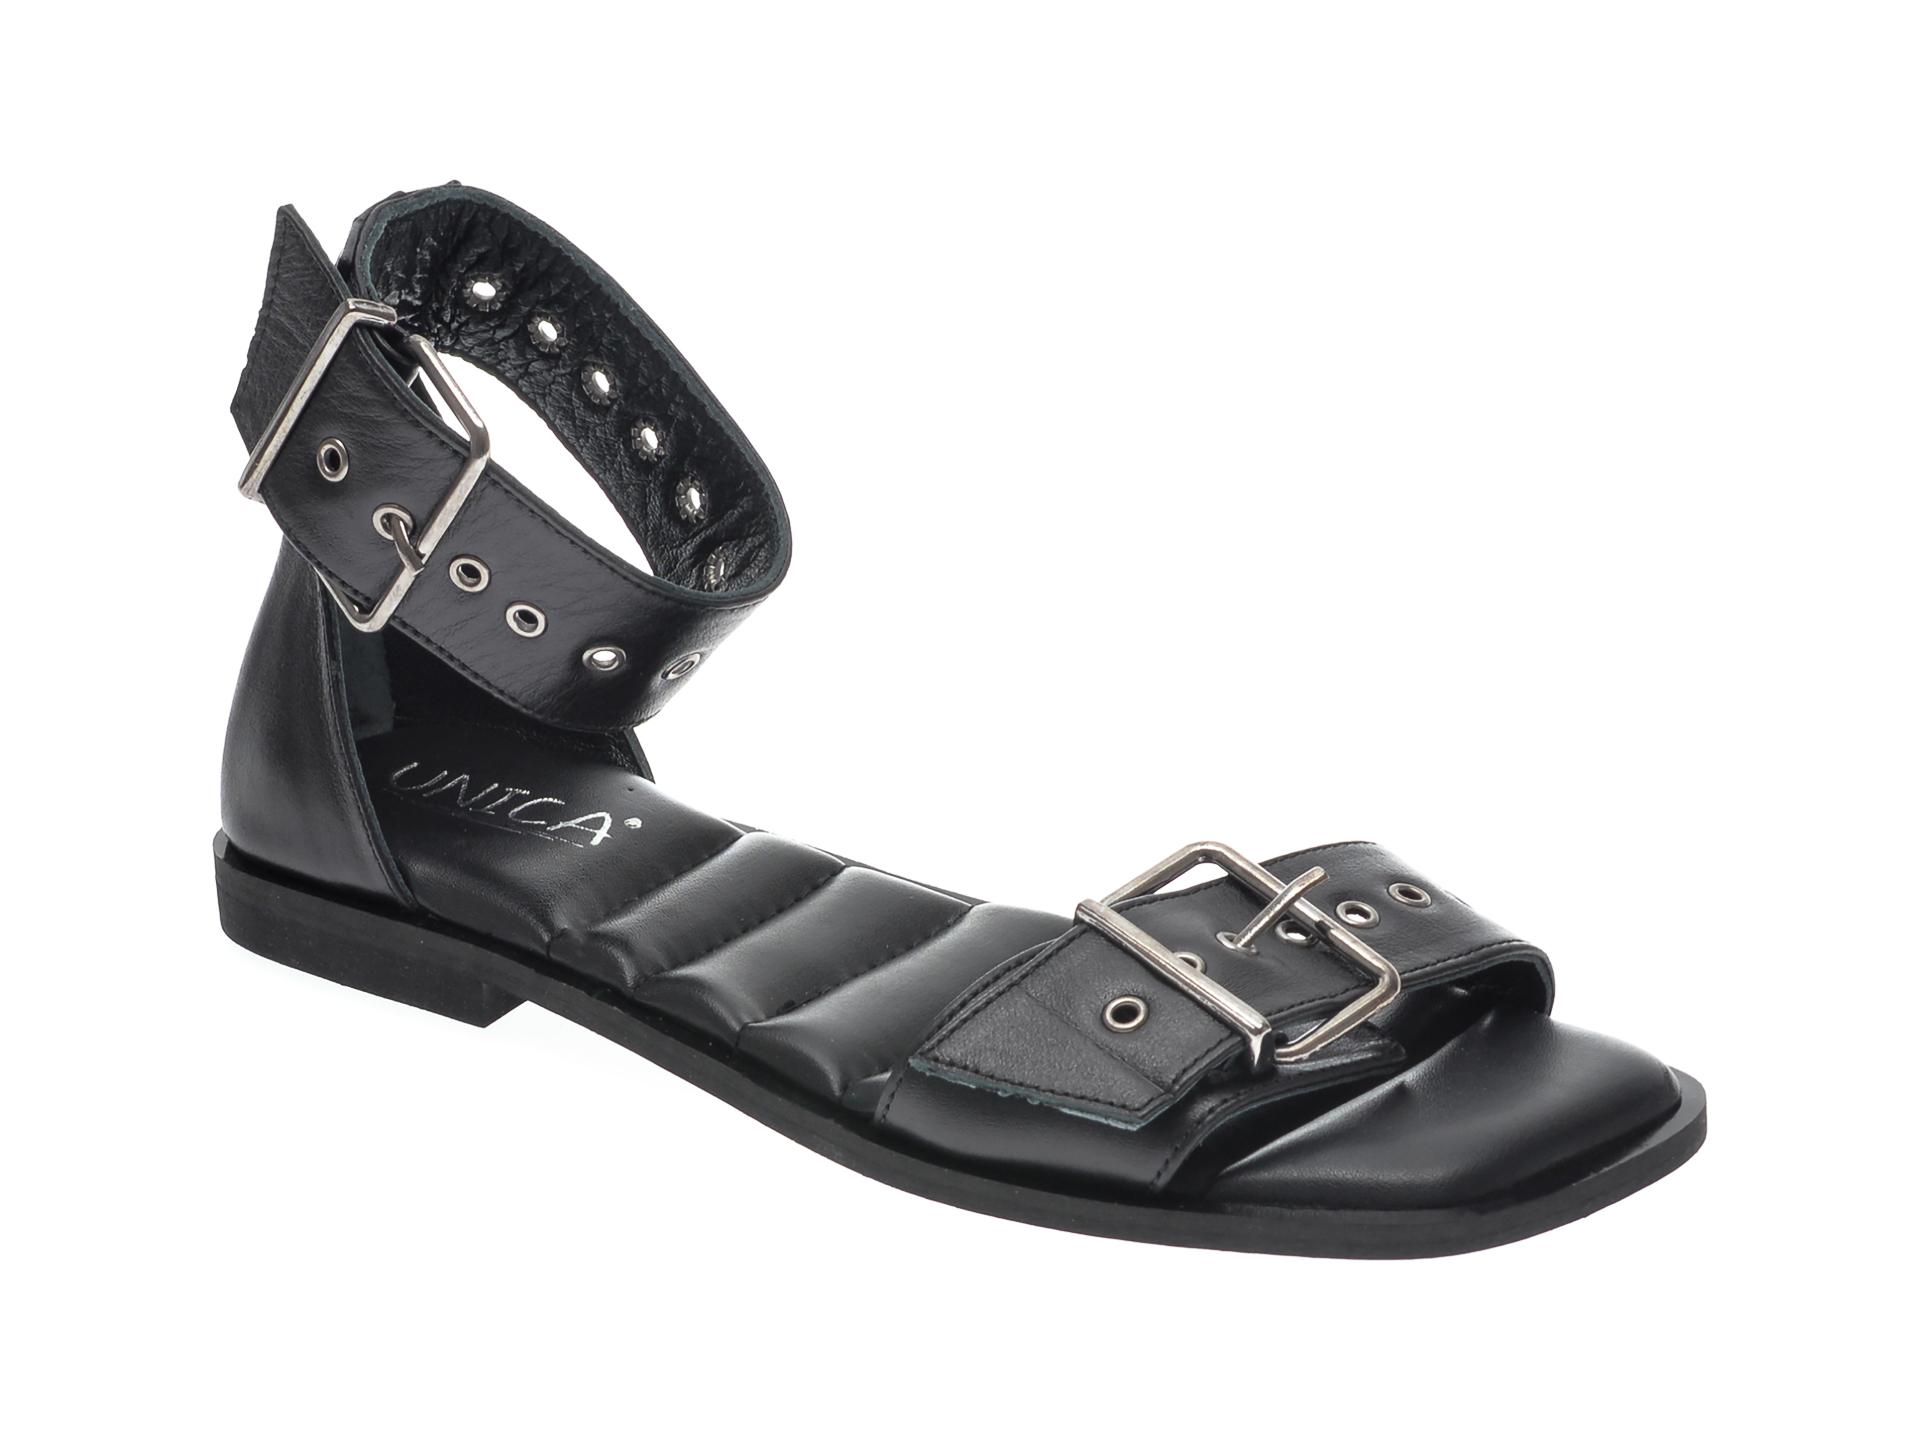 Sandale UNICA negre, A6796, din piele naturala imagine otter.ro